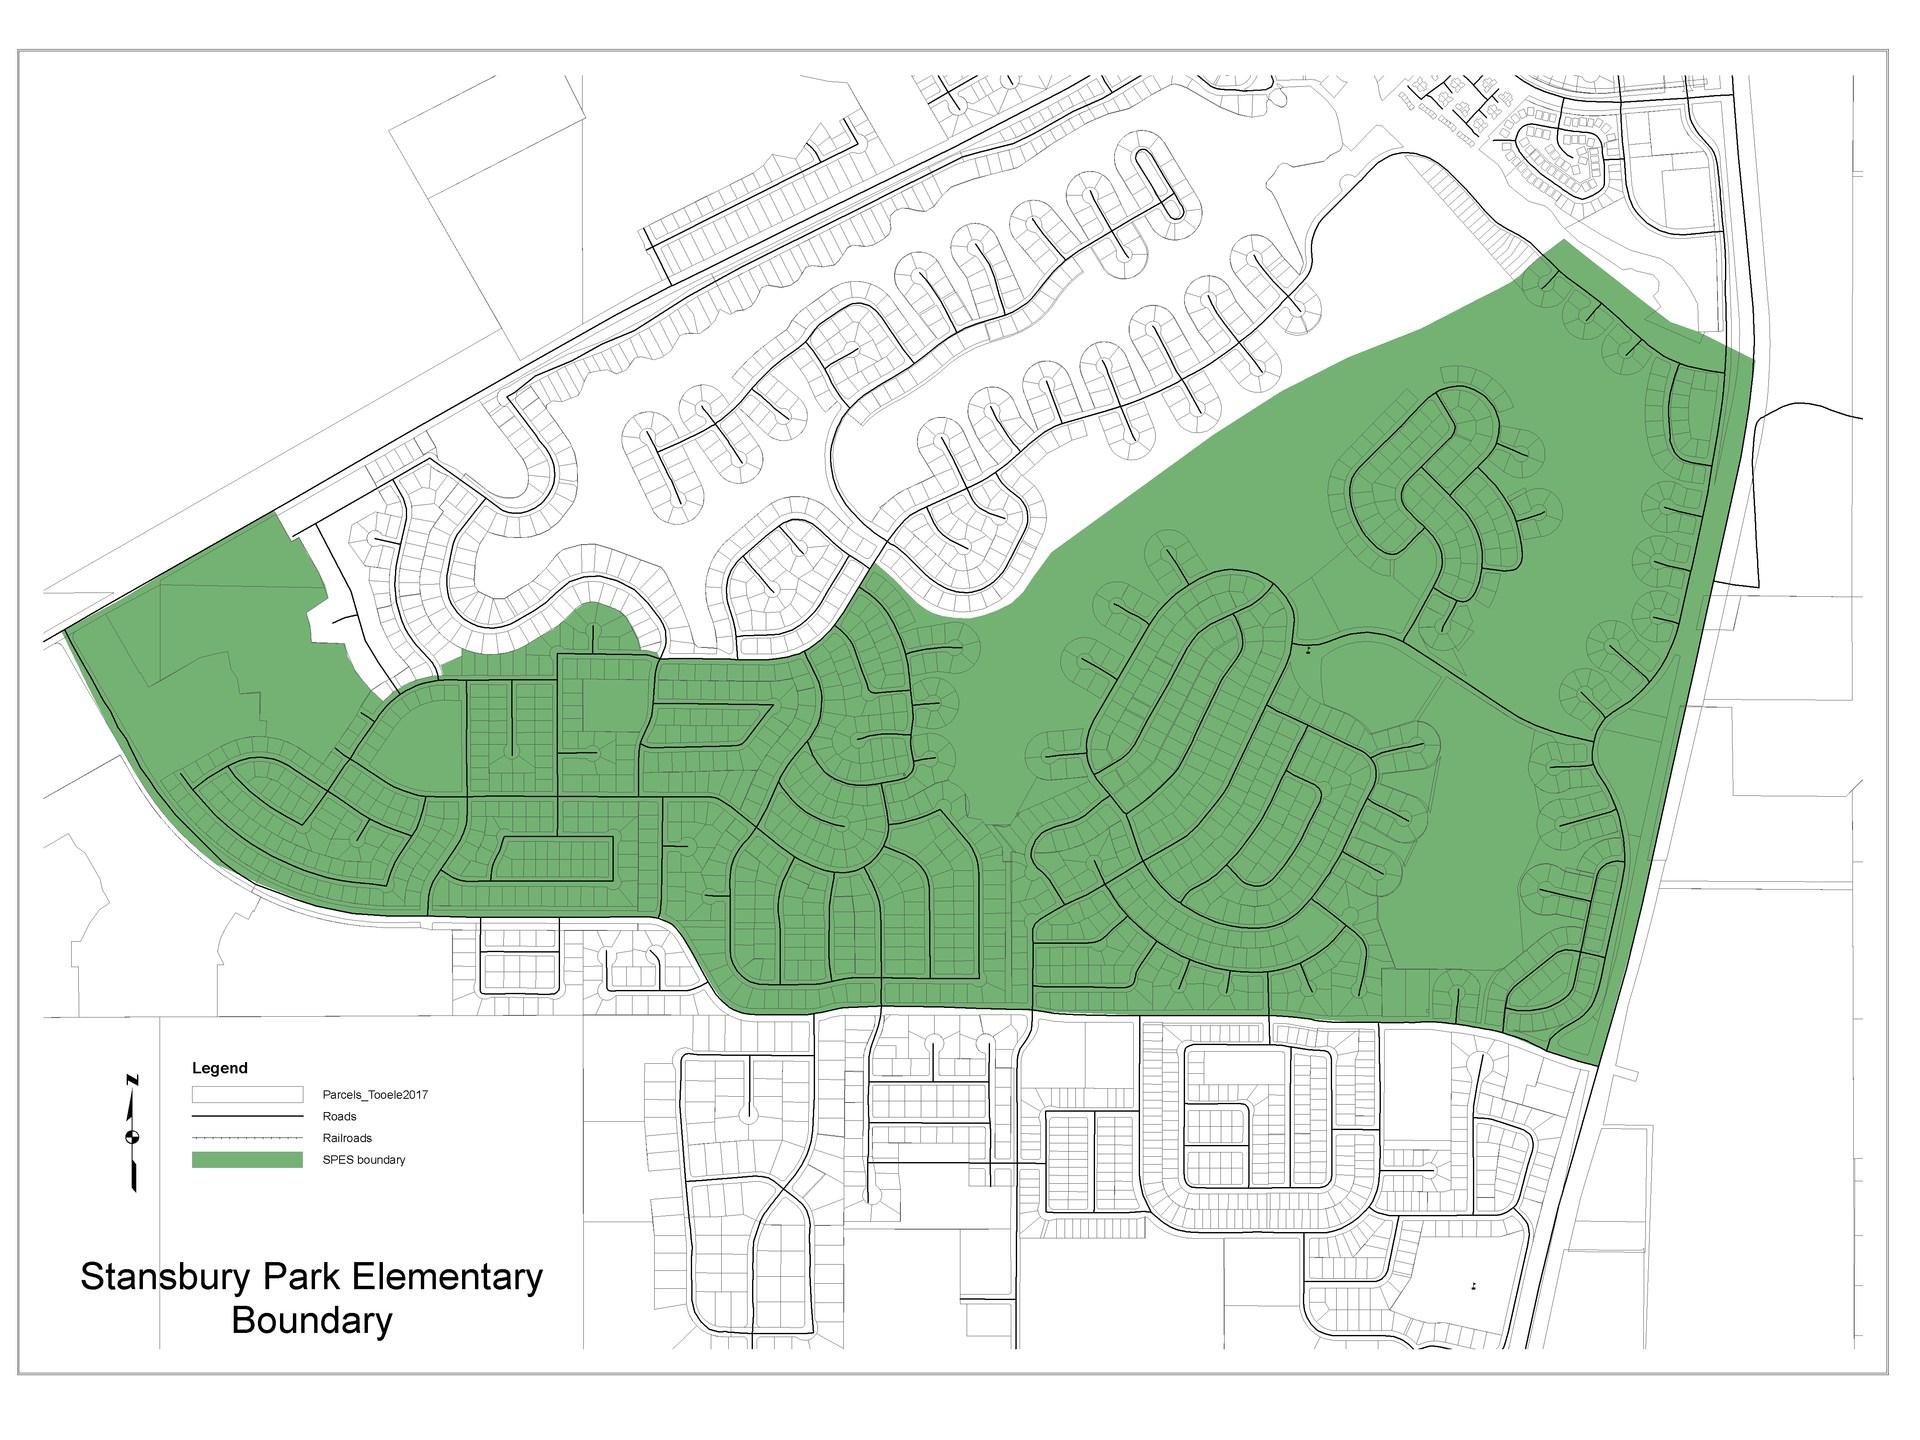 Stansbury Park Elementary Boundary